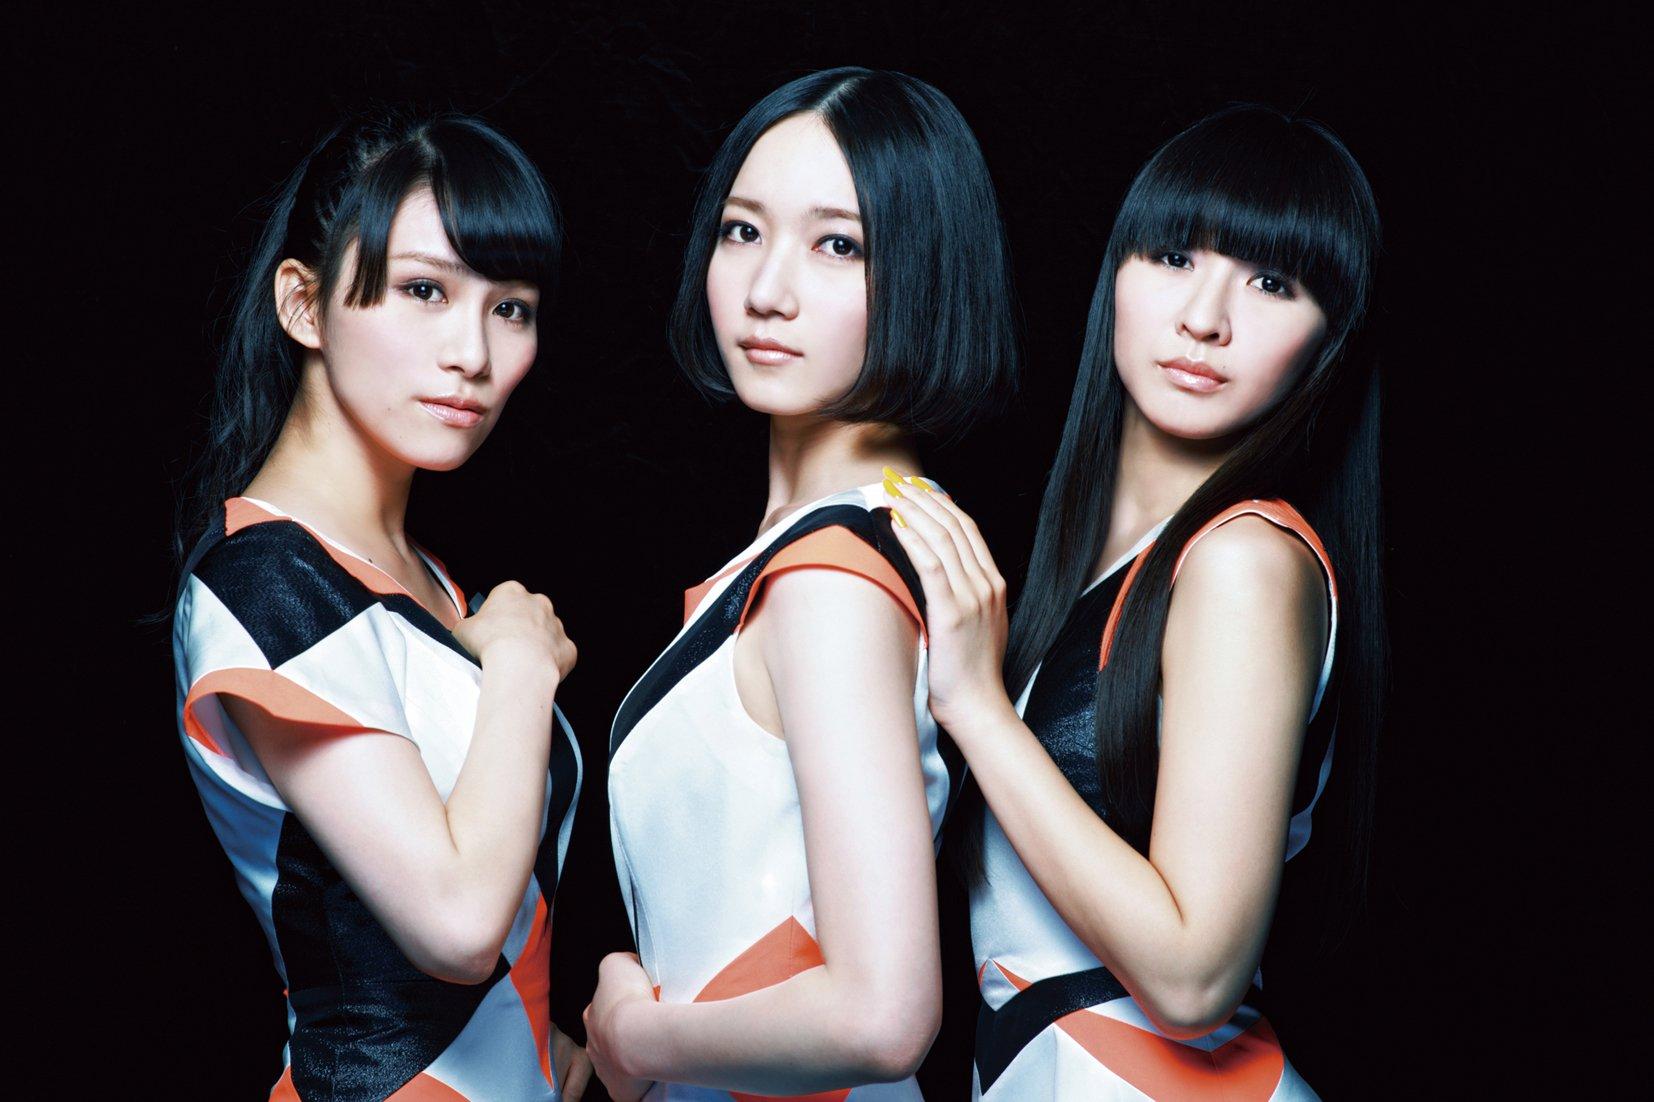 perfume akb48 fan original.jpg?resize=1200,630 - perfumeがakbに放った「ダンスが上達している」発言に非難殺到!